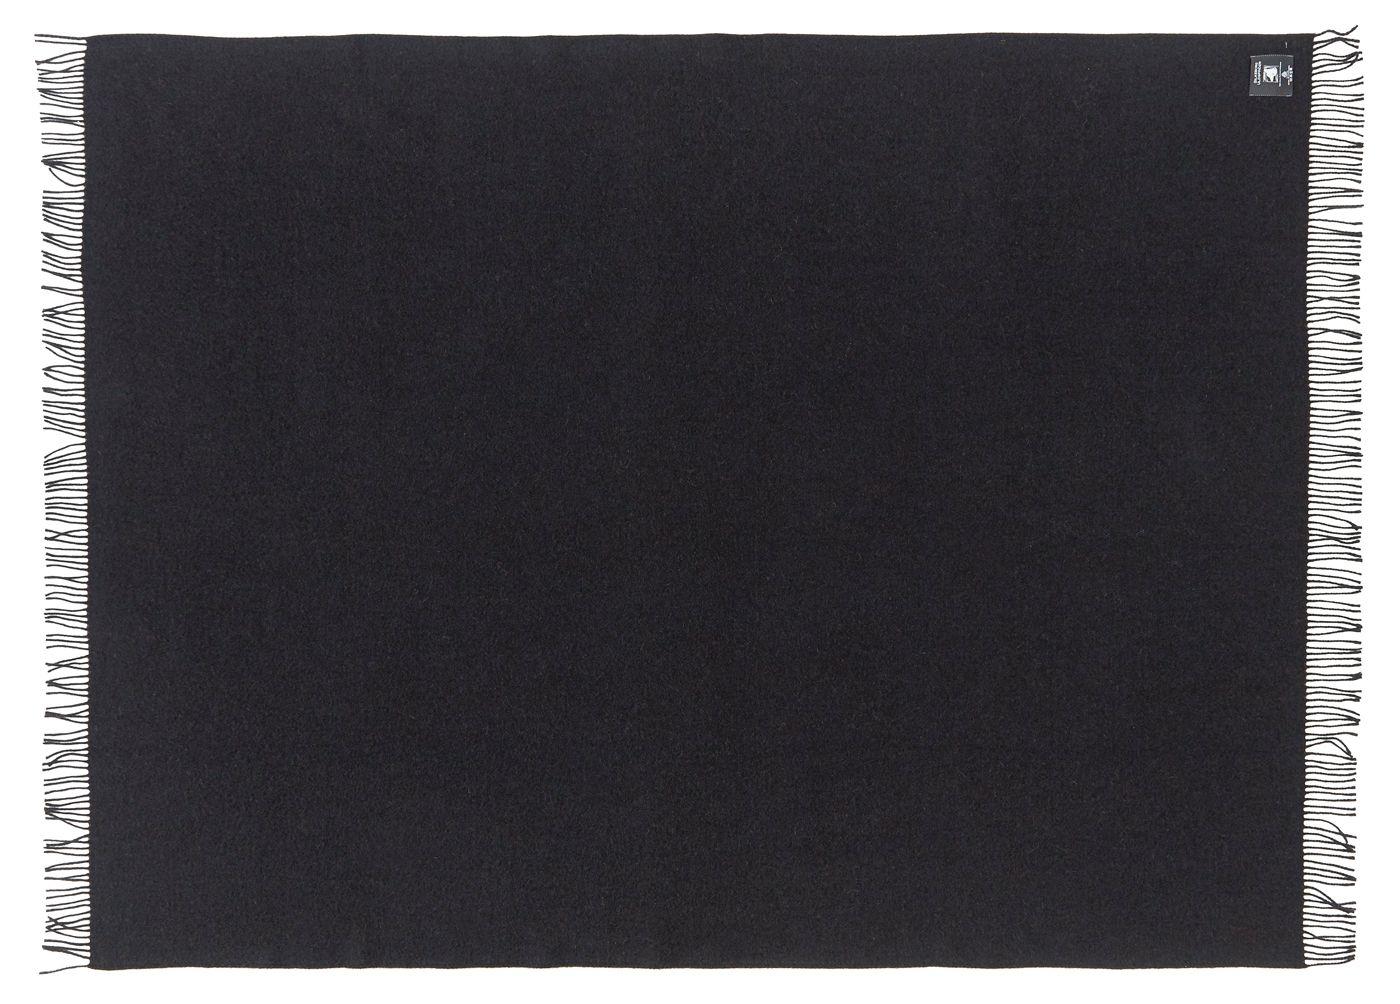 Athen Plaid, Uld, Black, 200x130 - Silkeborg Uldspinderi